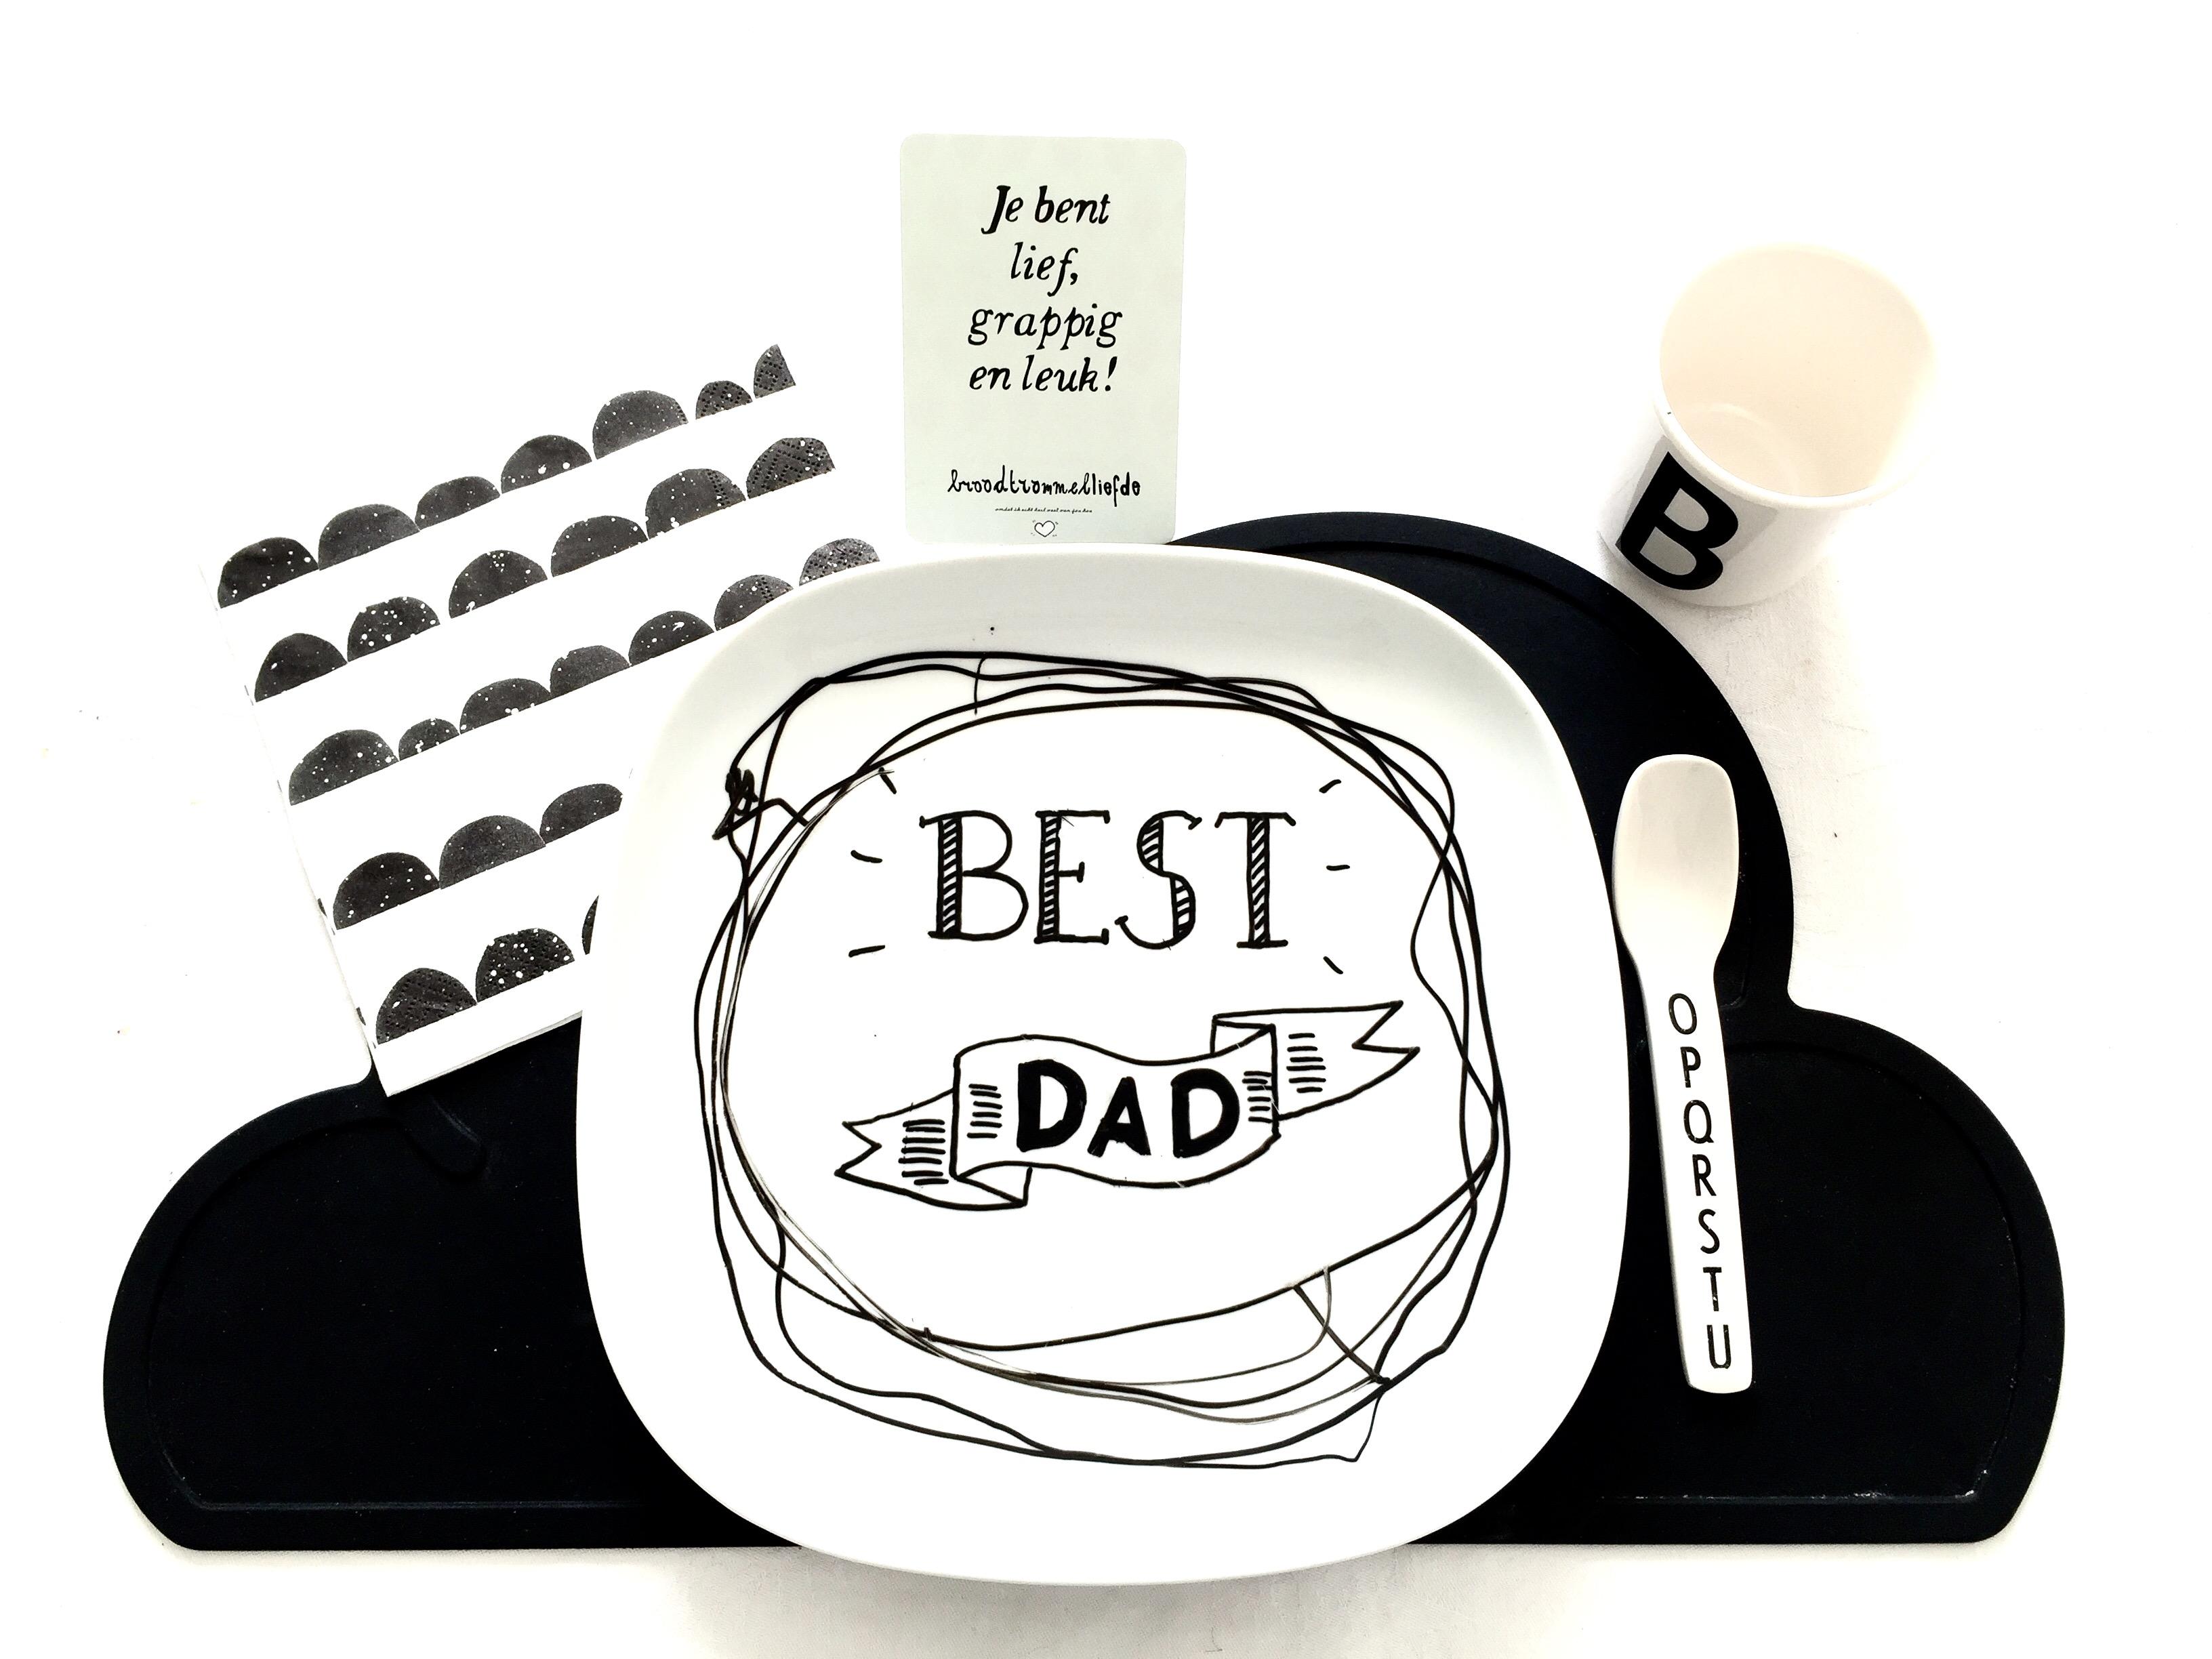 DIY vaderdag cadeau